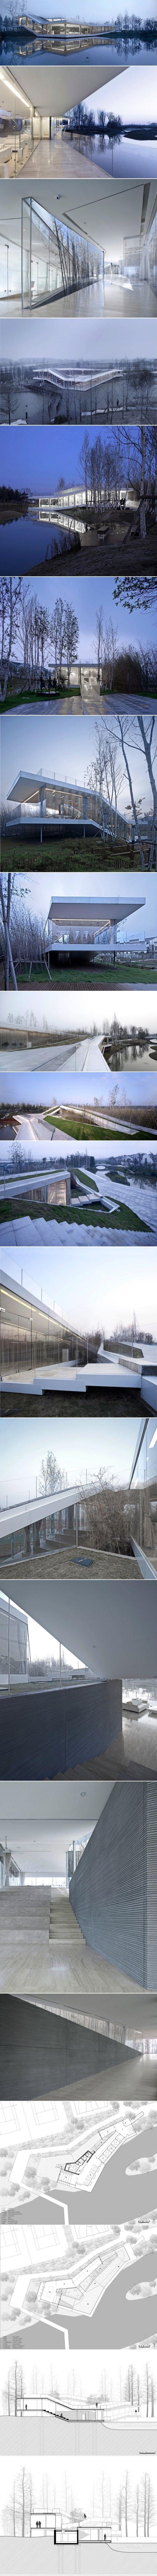 Riverside Clubhouse Yancheng, Jiangsu | China (People's Republic of) | Completed 2010